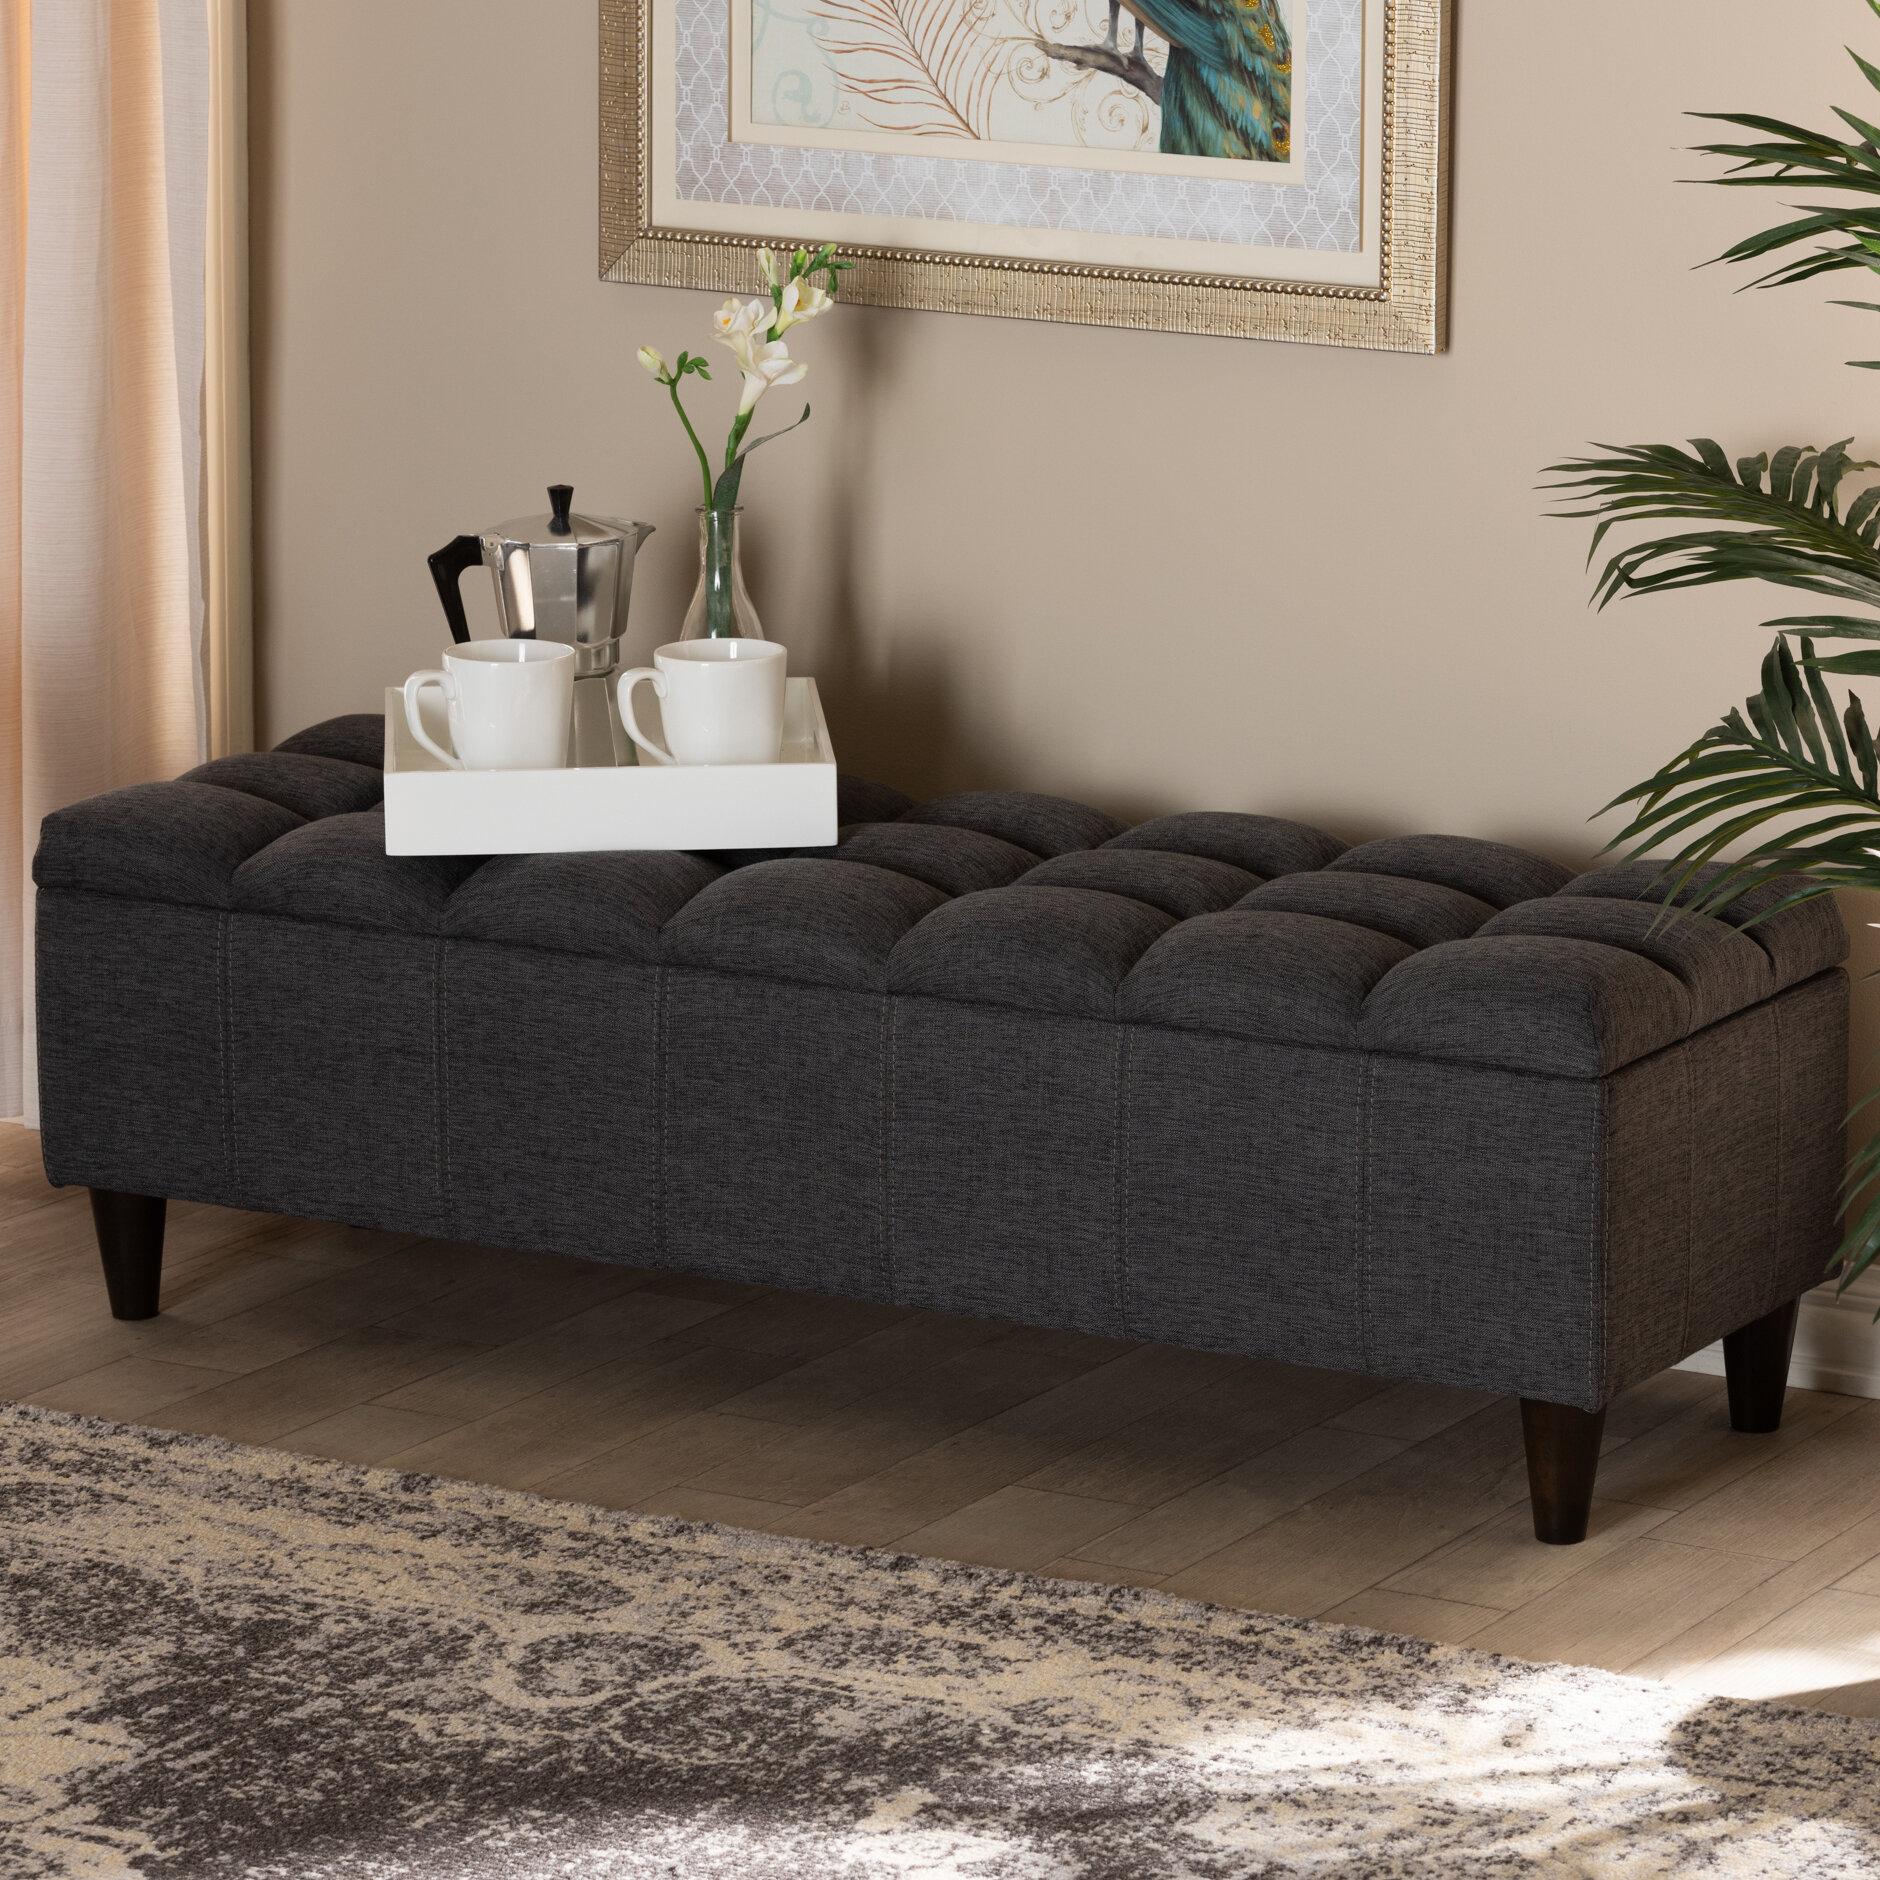 Quam Upholstered Storage Bench